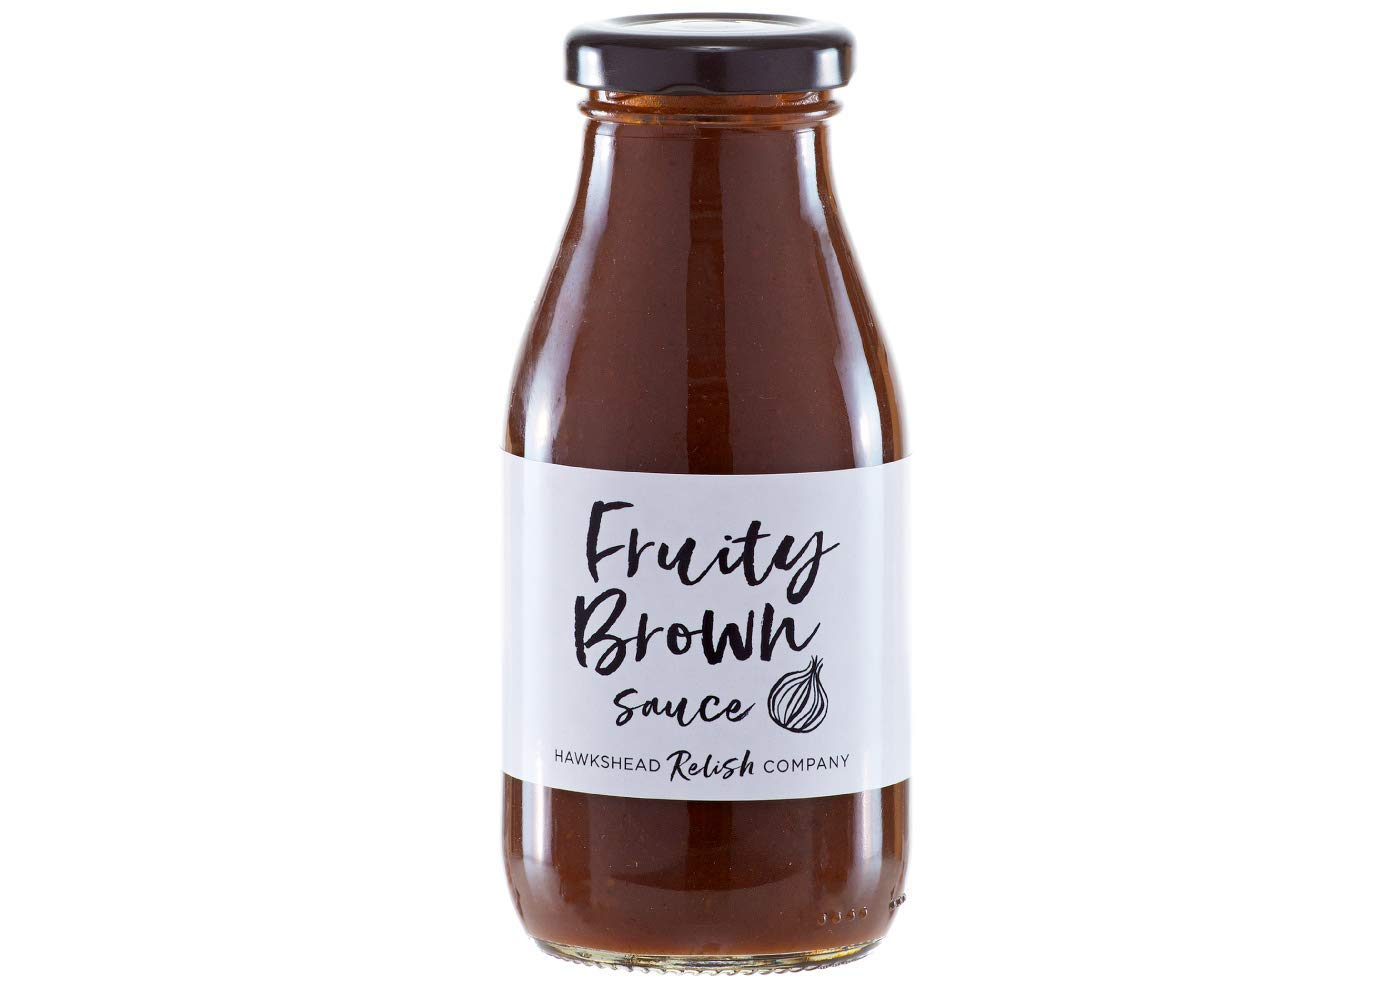 Hawkshead Relish Co - Brown Sauce